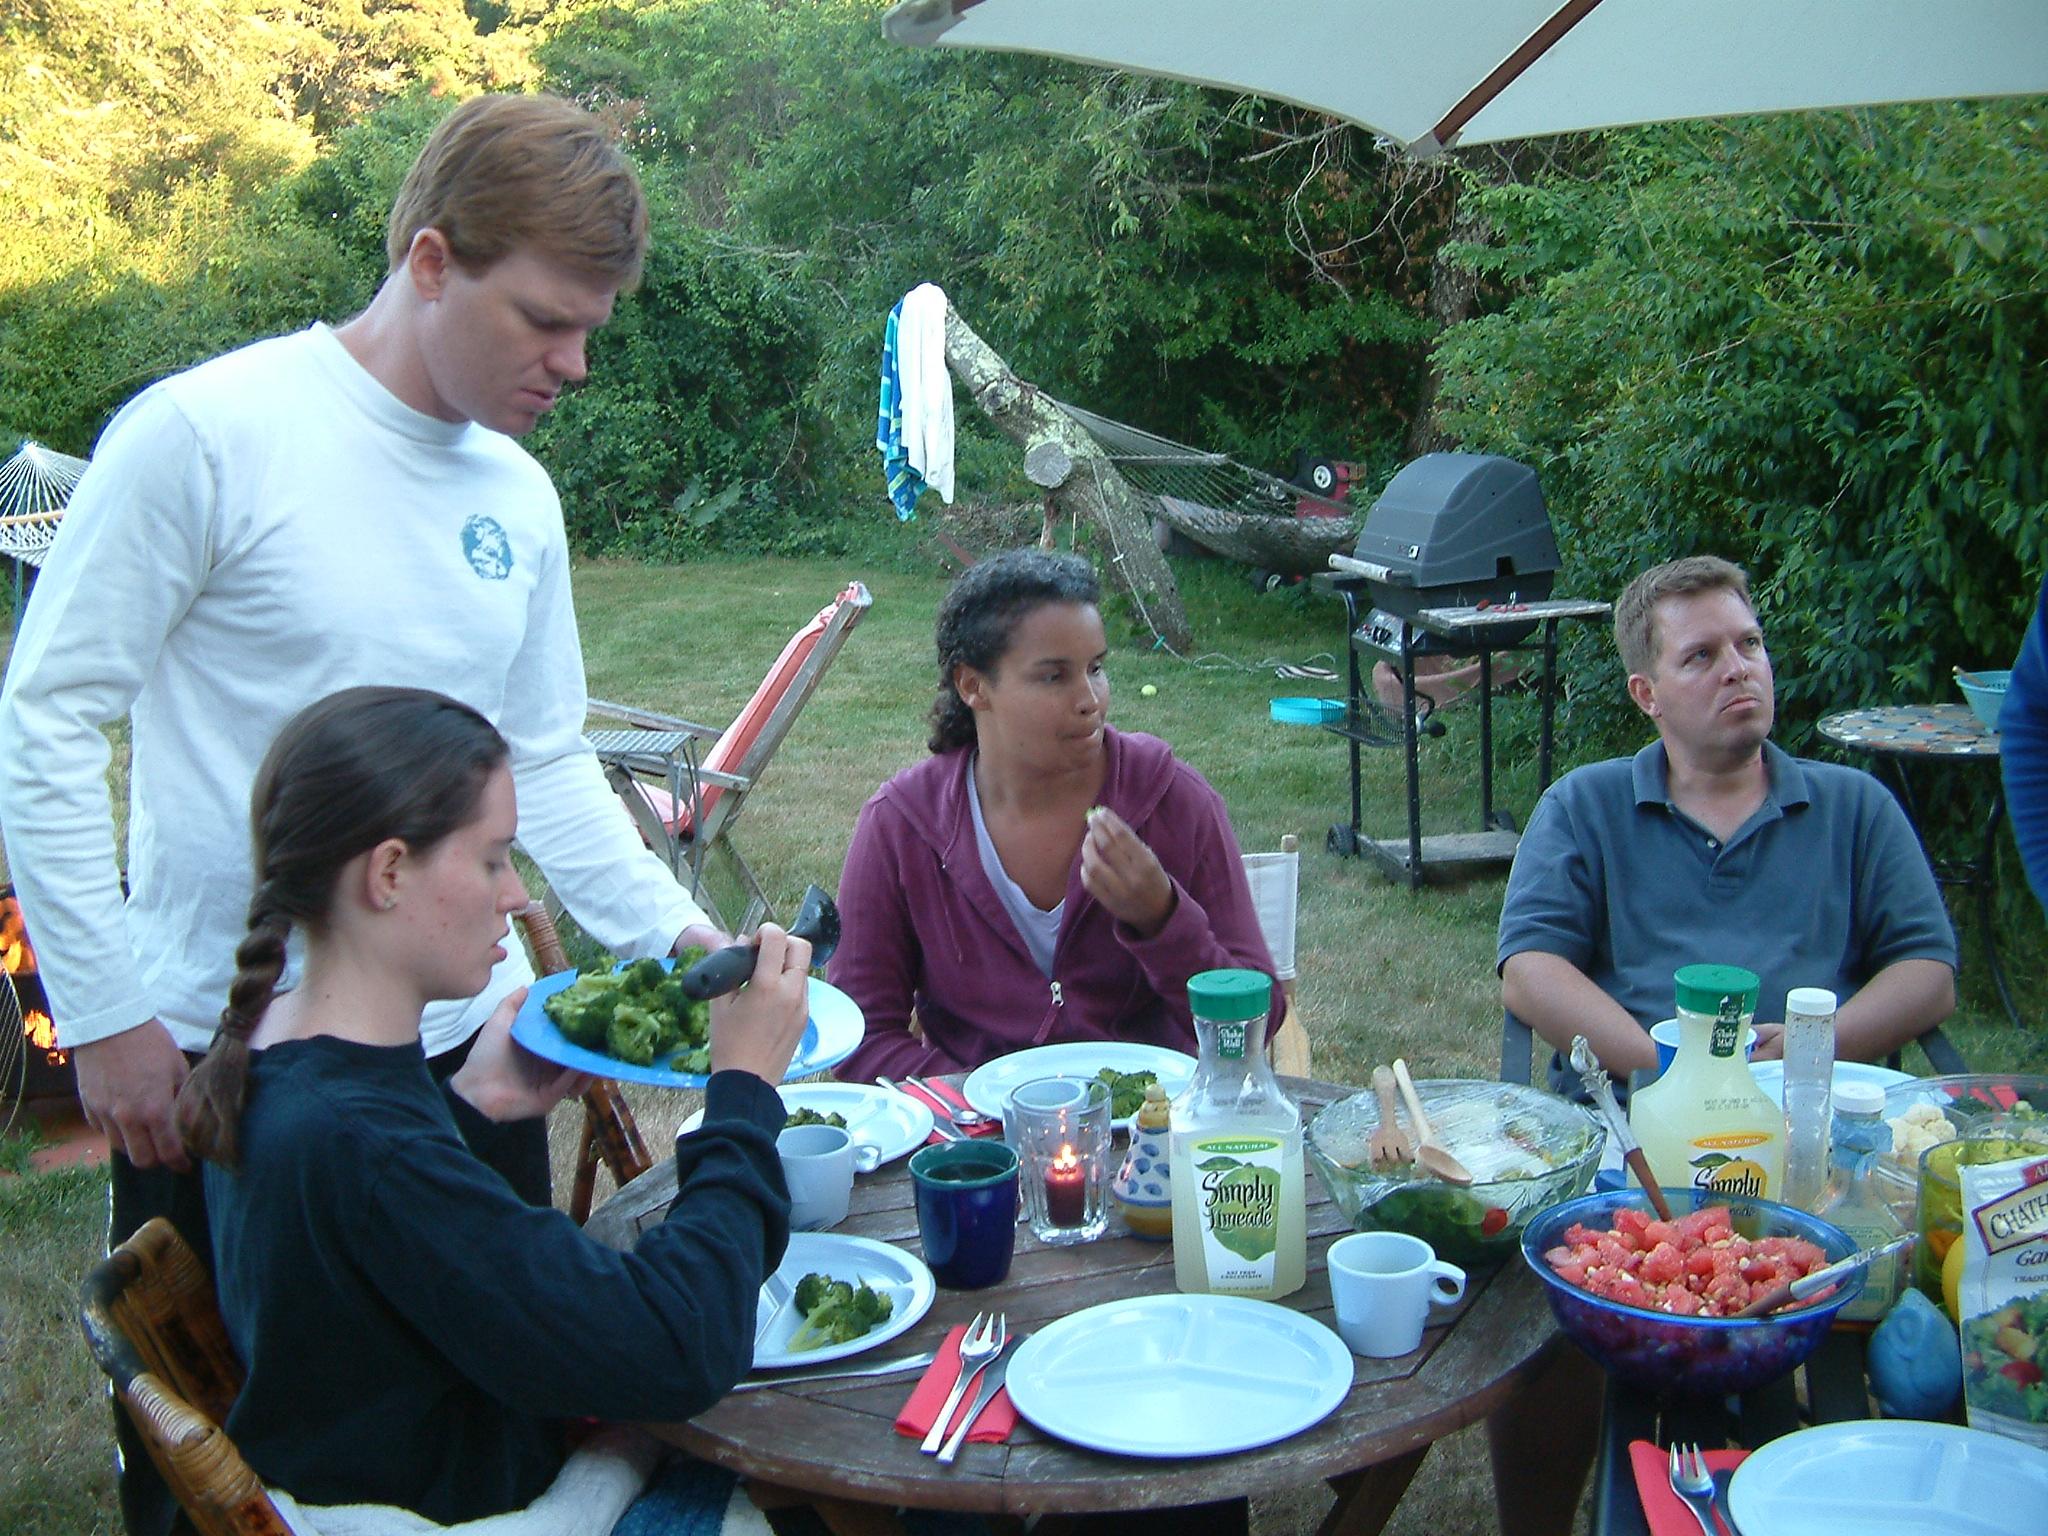 recipe watermelon arugula and pine nut salad kitchen report